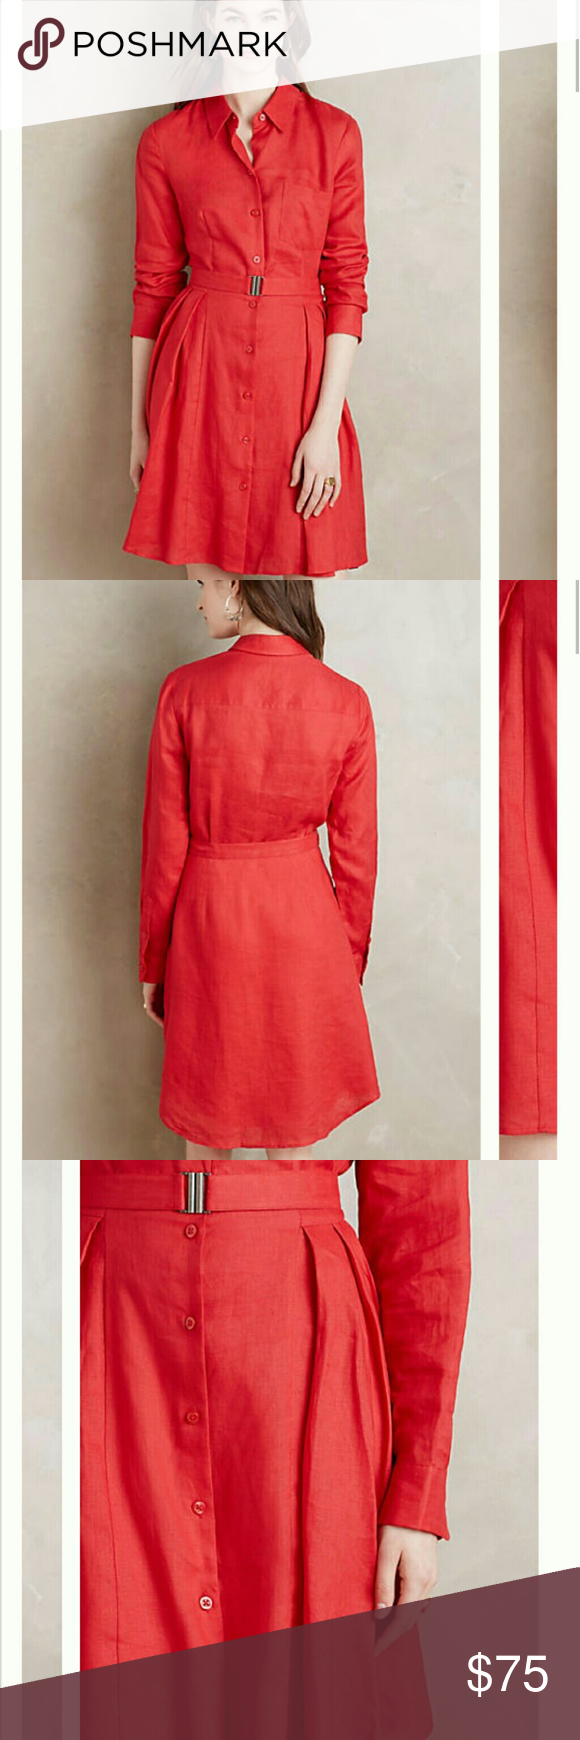 6c9ae83d32 Laila Linen Shirtdress by HD in Paris NWOT